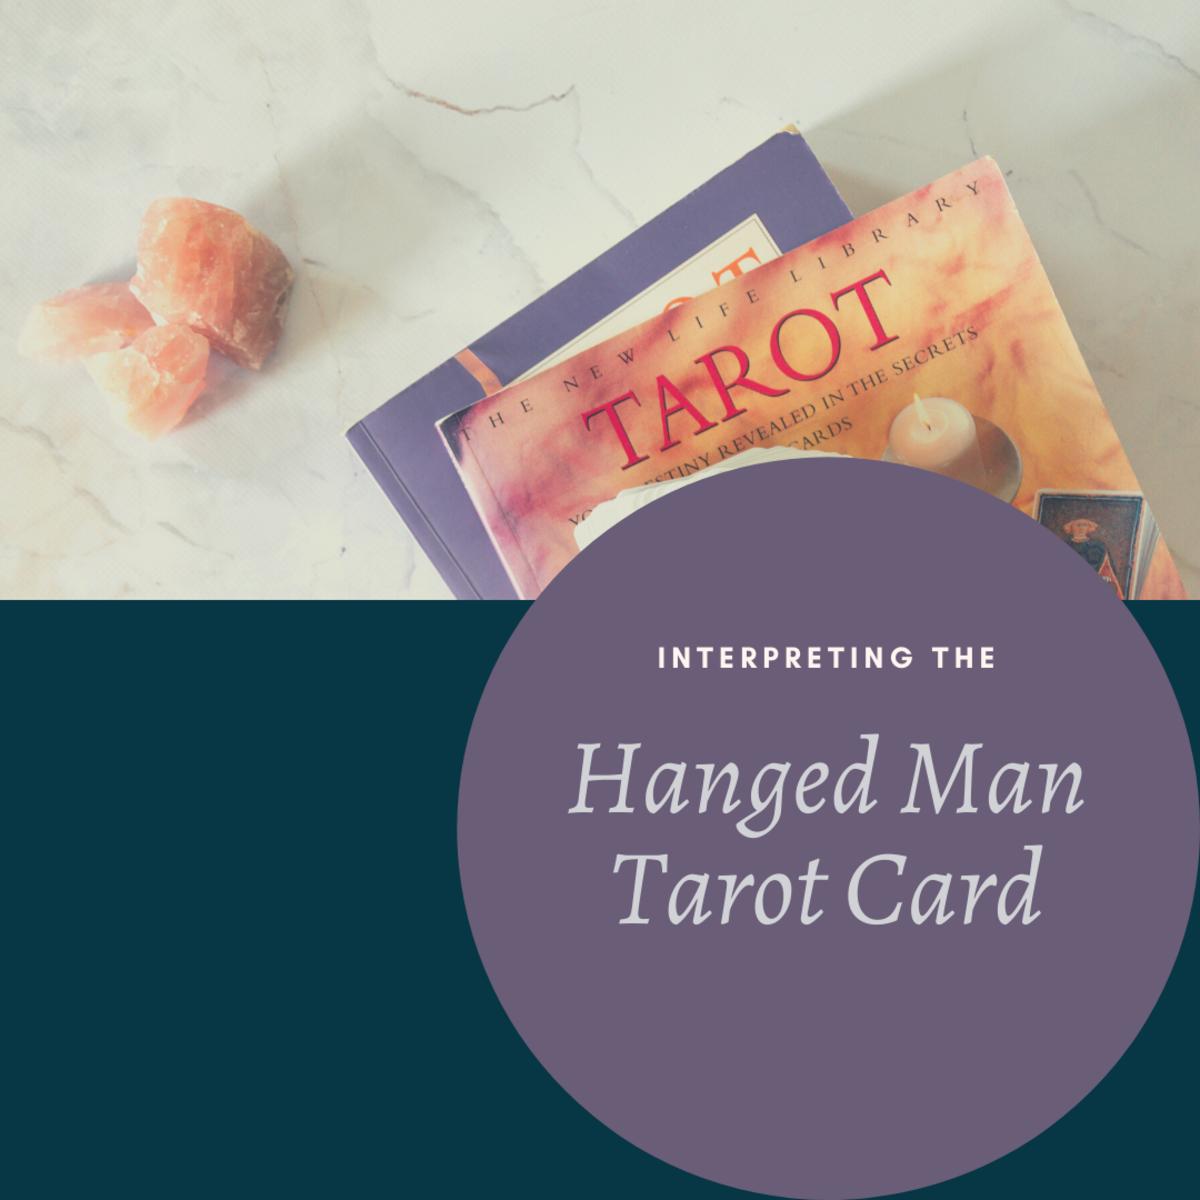 The Hanged Man has multiple interpretations.